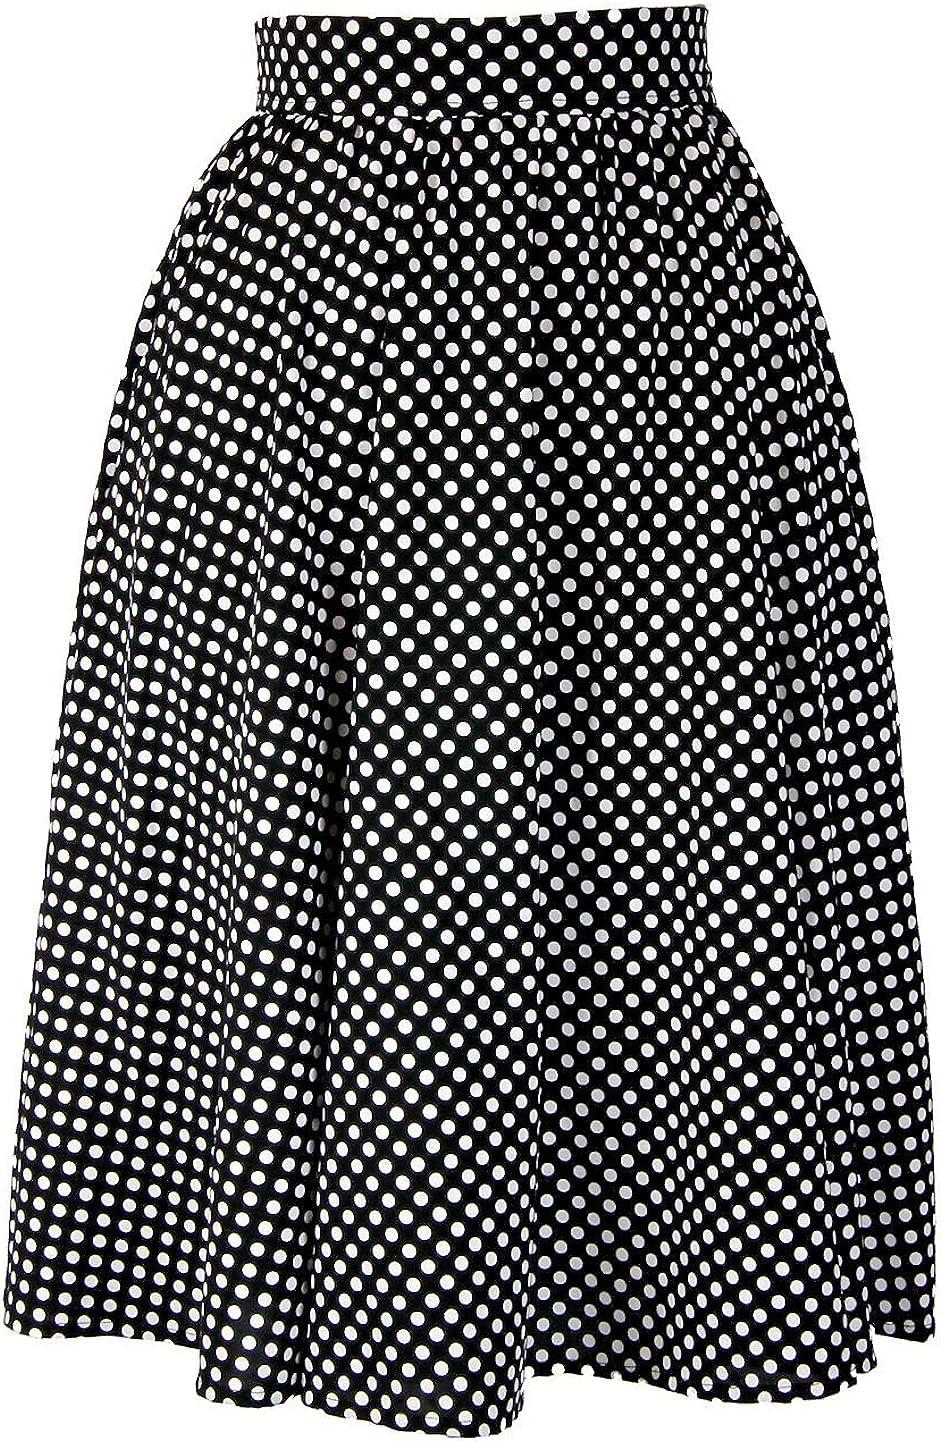 Nyteez Women's Vintage Style Polka Dot A-line Circle Skirt